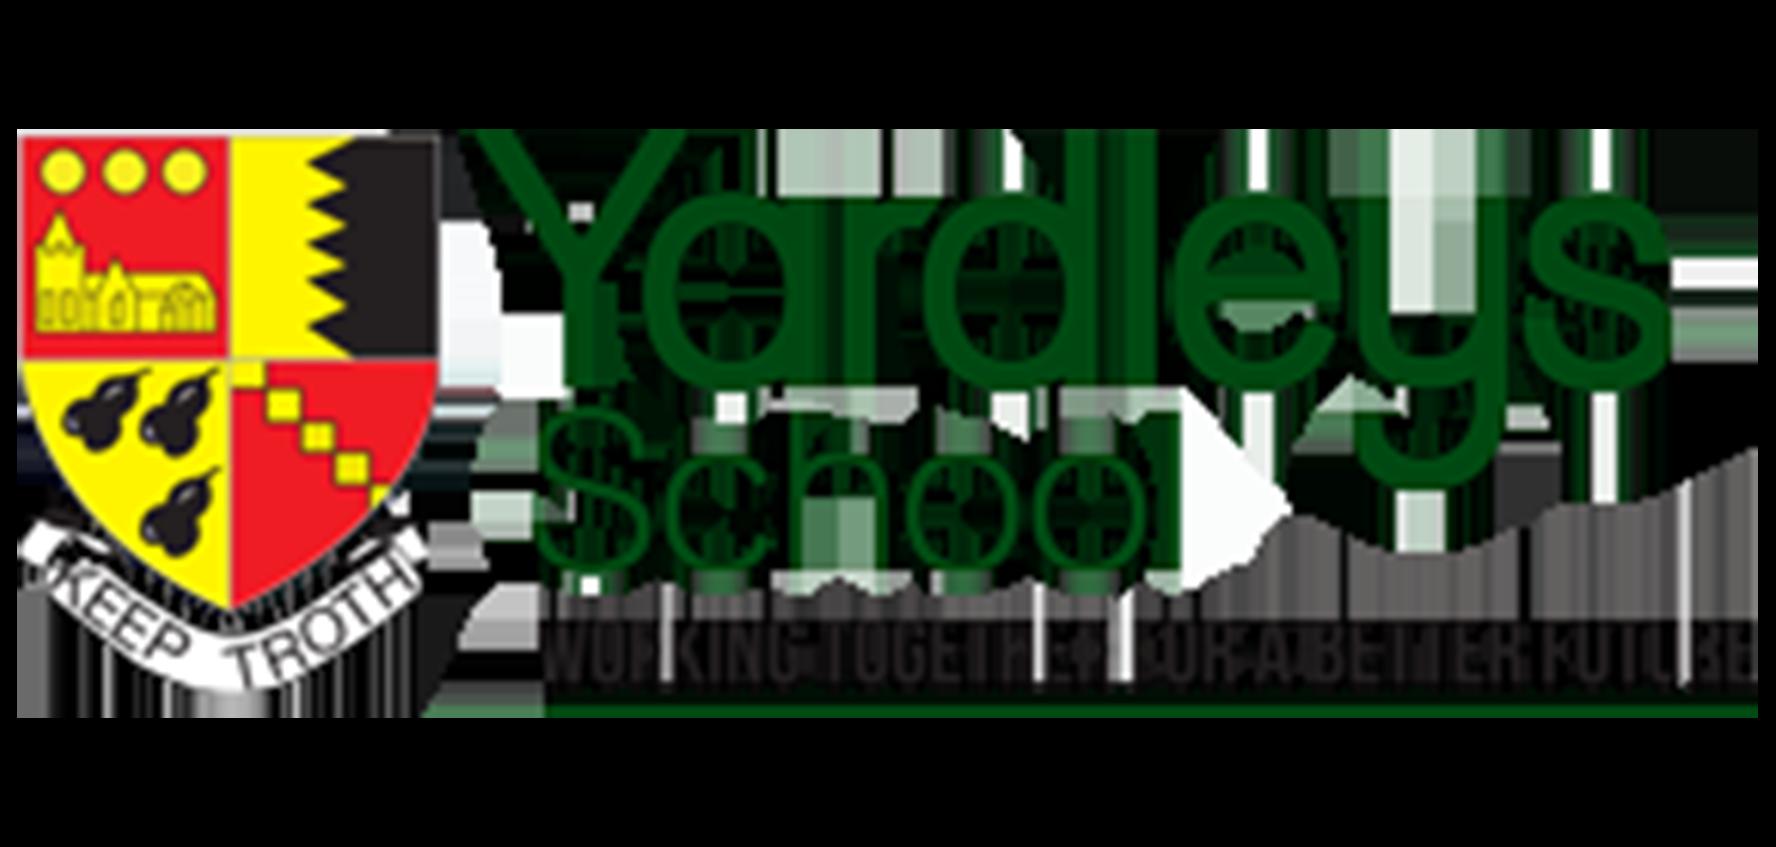 Yardleys